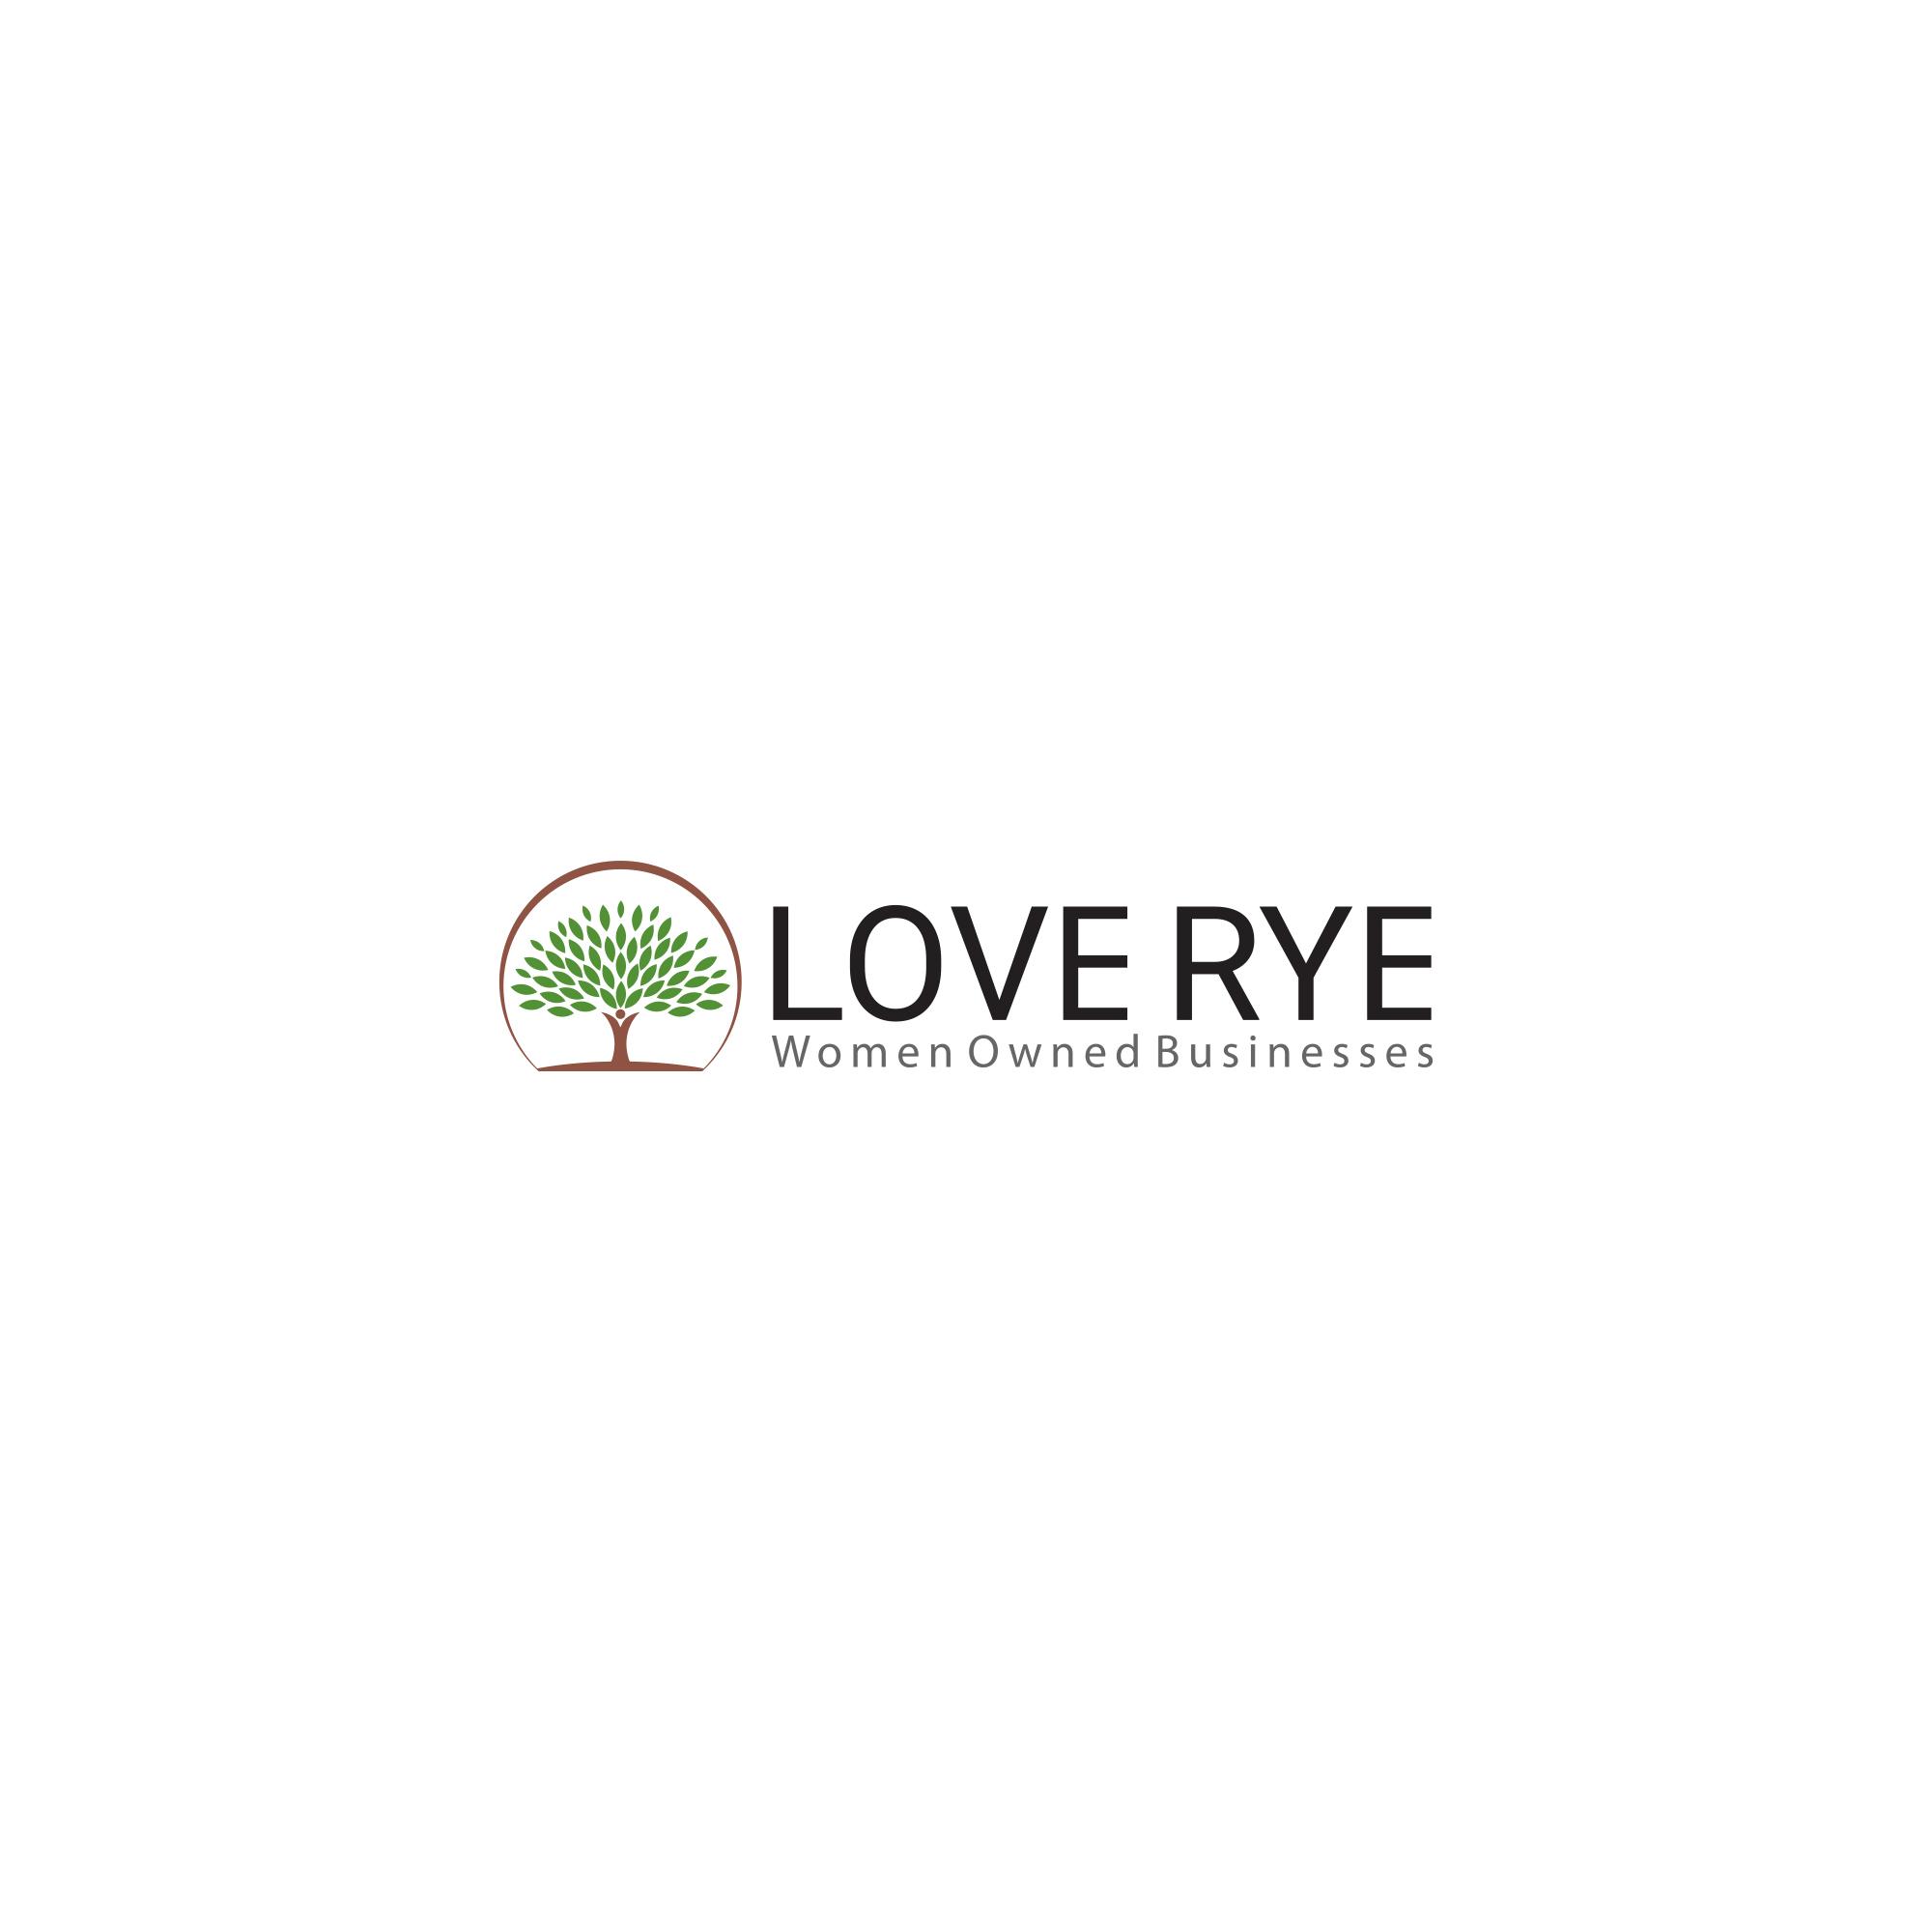 Love Rye